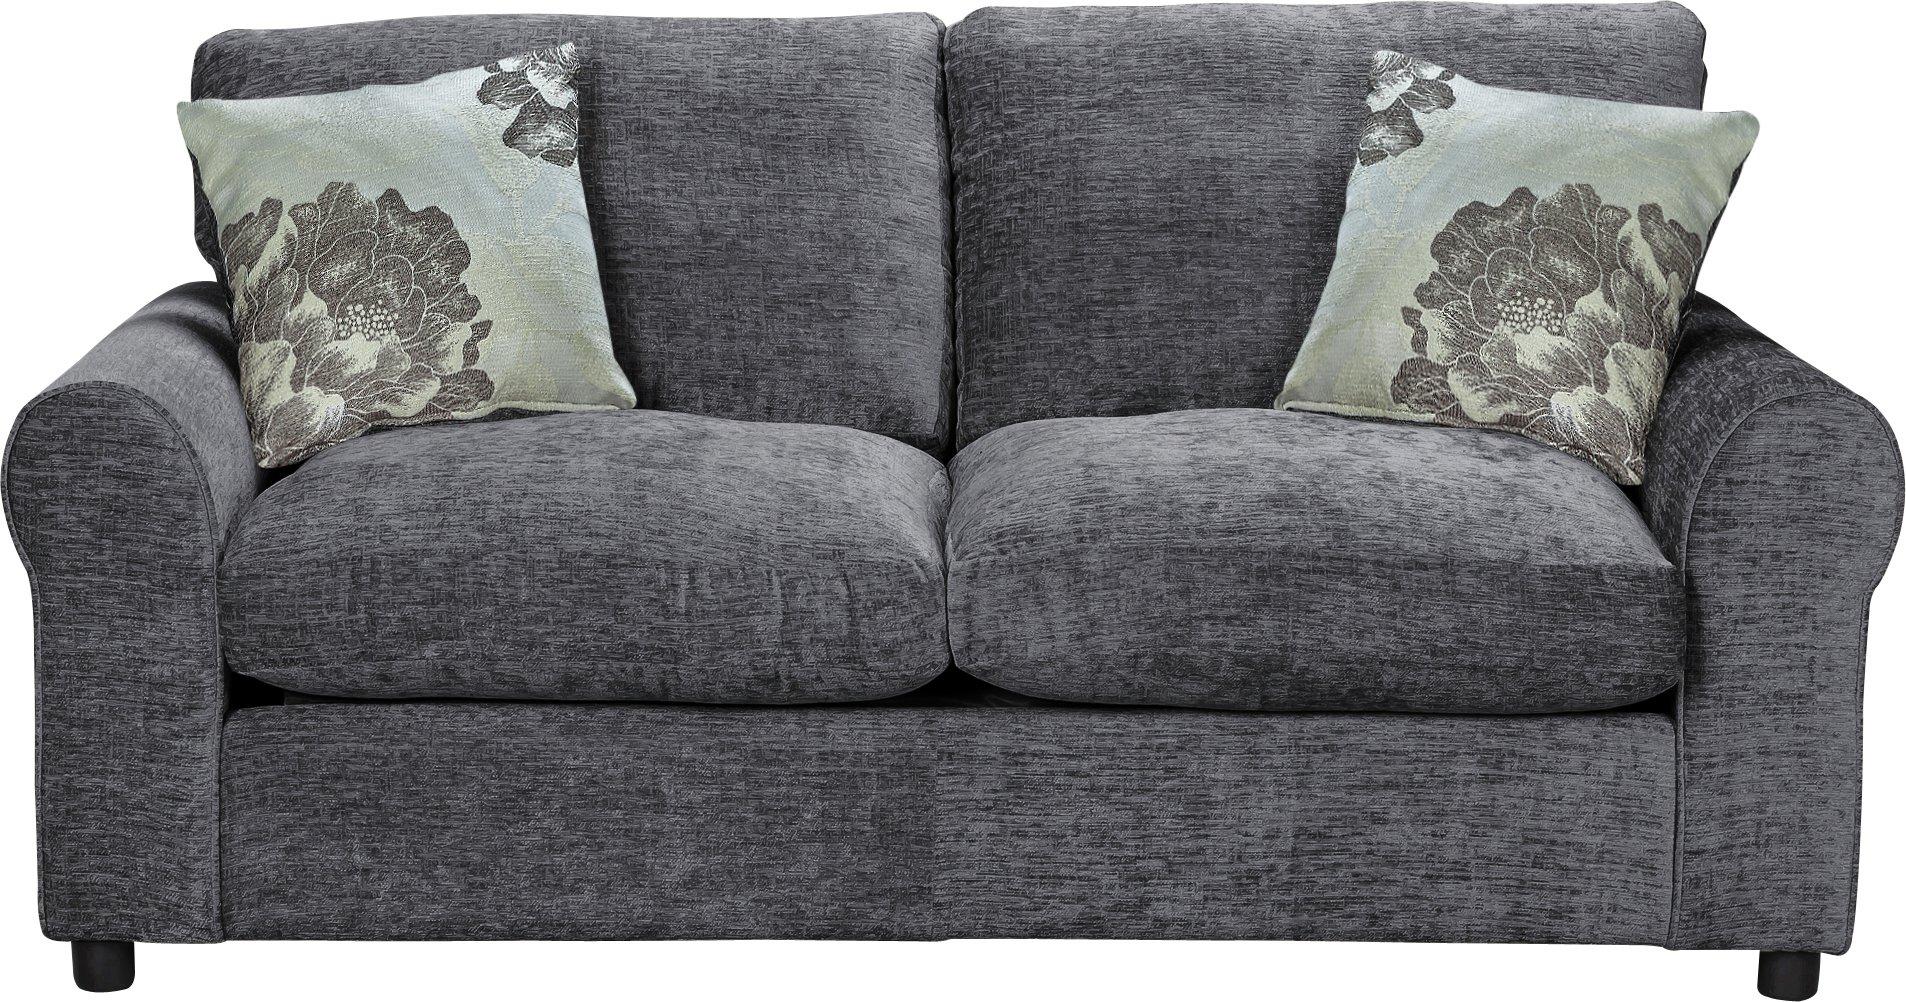 argos home tessa 2 seater fabric sofa bed charcoal. Black Bedroom Furniture Sets. Home Design Ideas